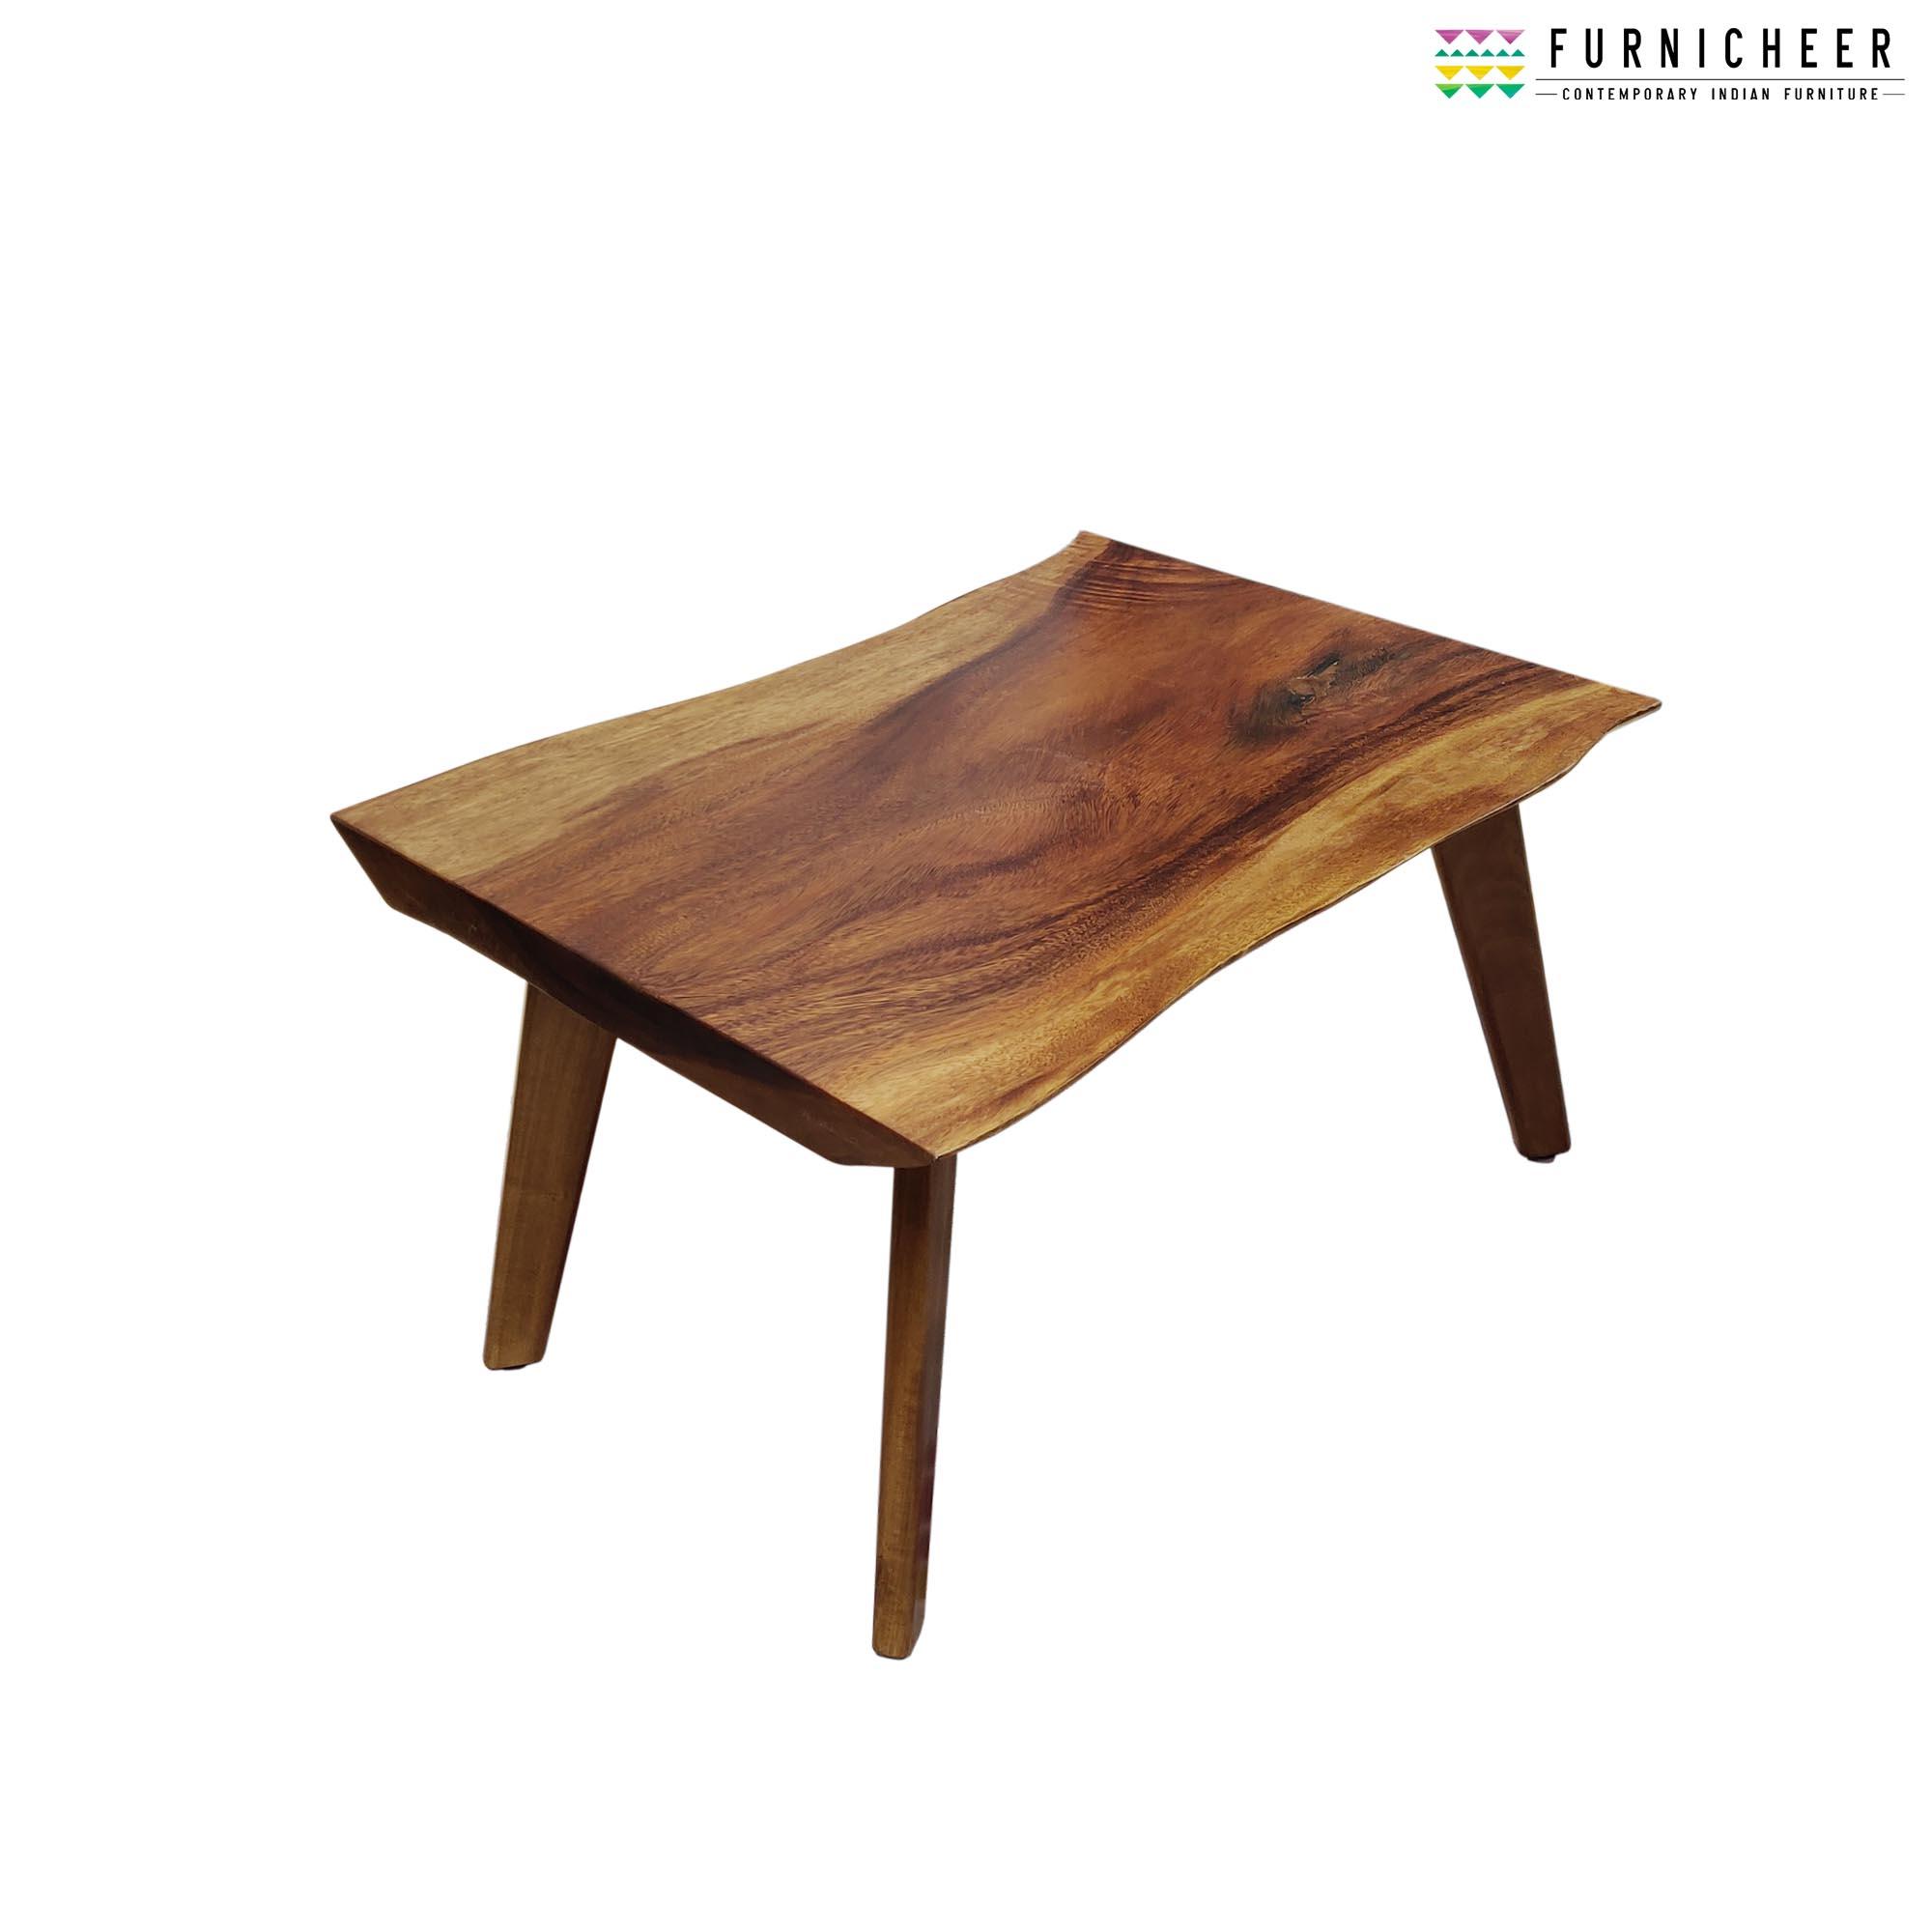 3.COFFEE TABLE SKU TBNW2916